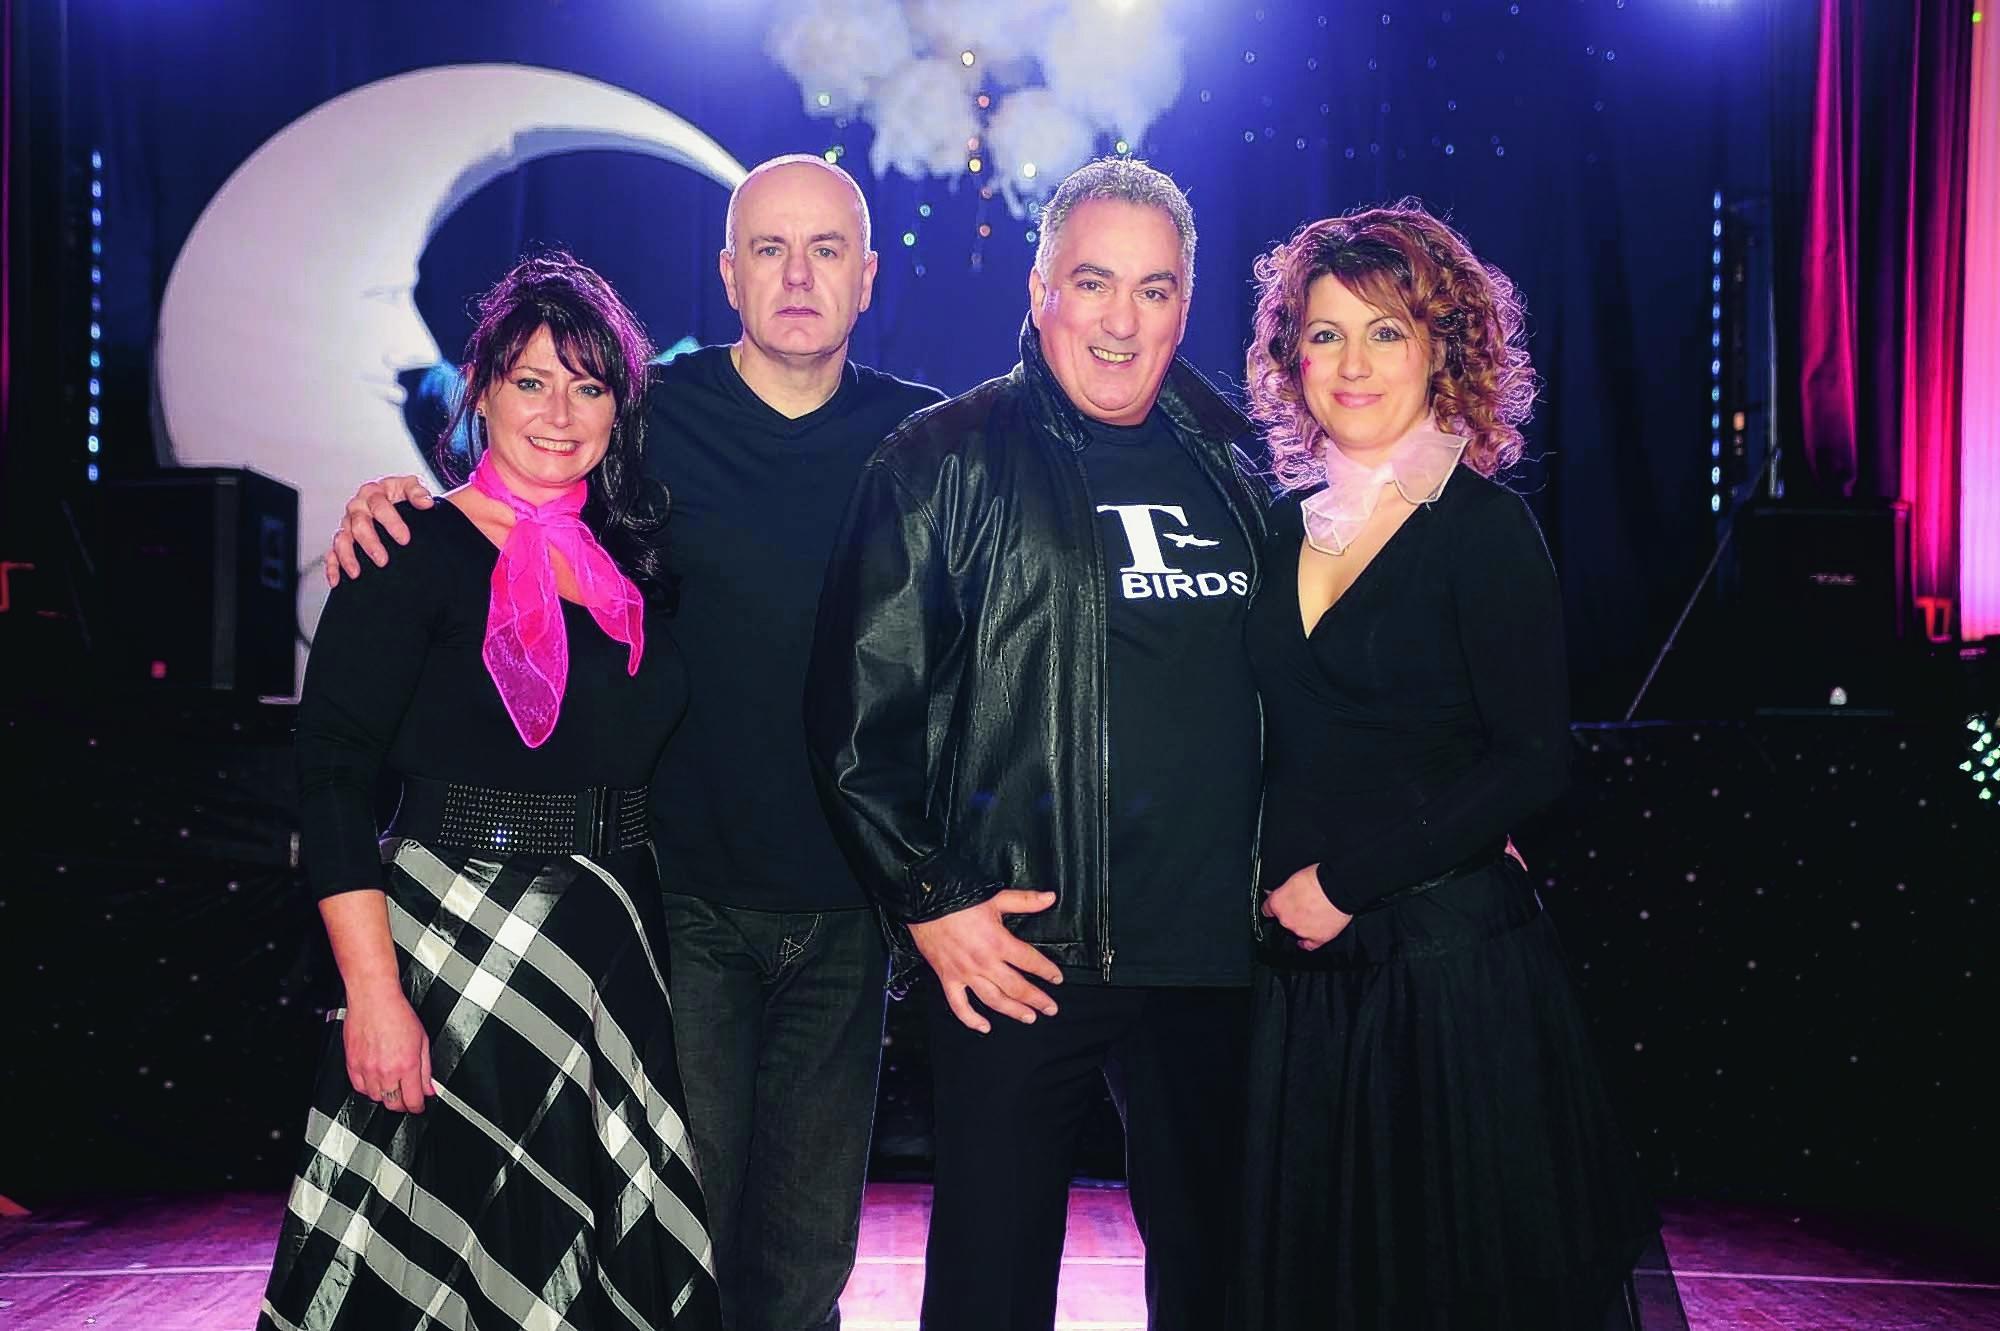 Sharon Taylor, Dougie McPhee, Findlay Sinclair and Vasia Hristova